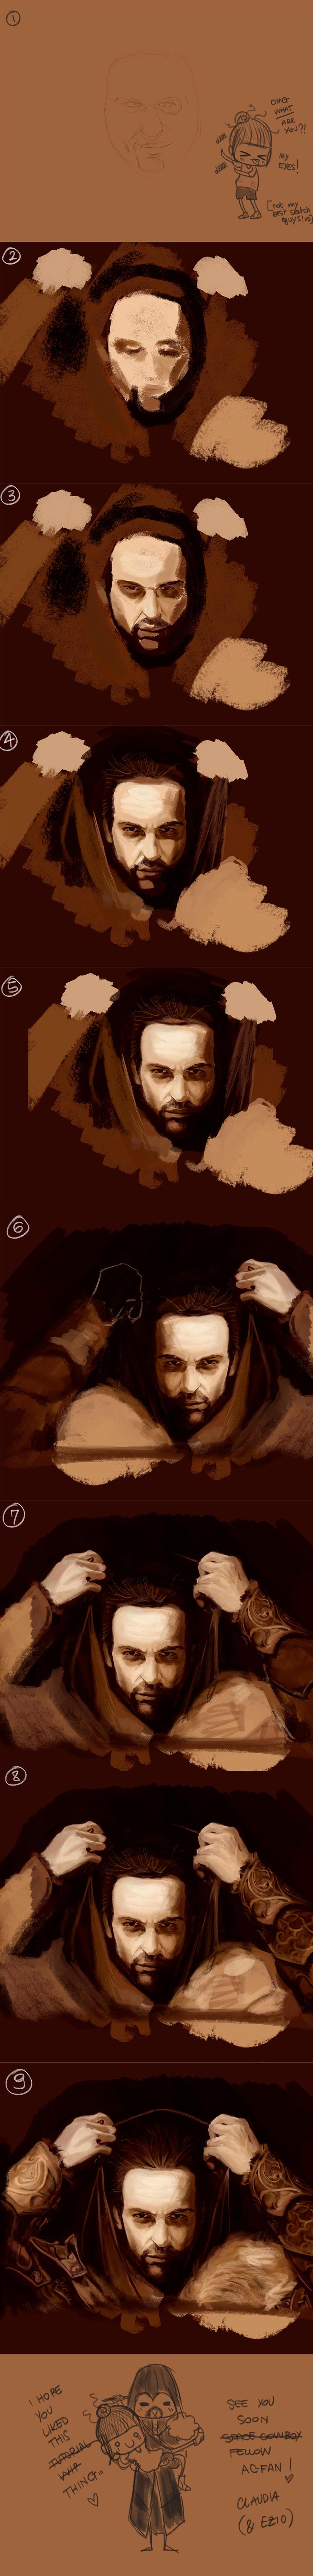 Ezio A. TUTORIAL by WisesnailArt